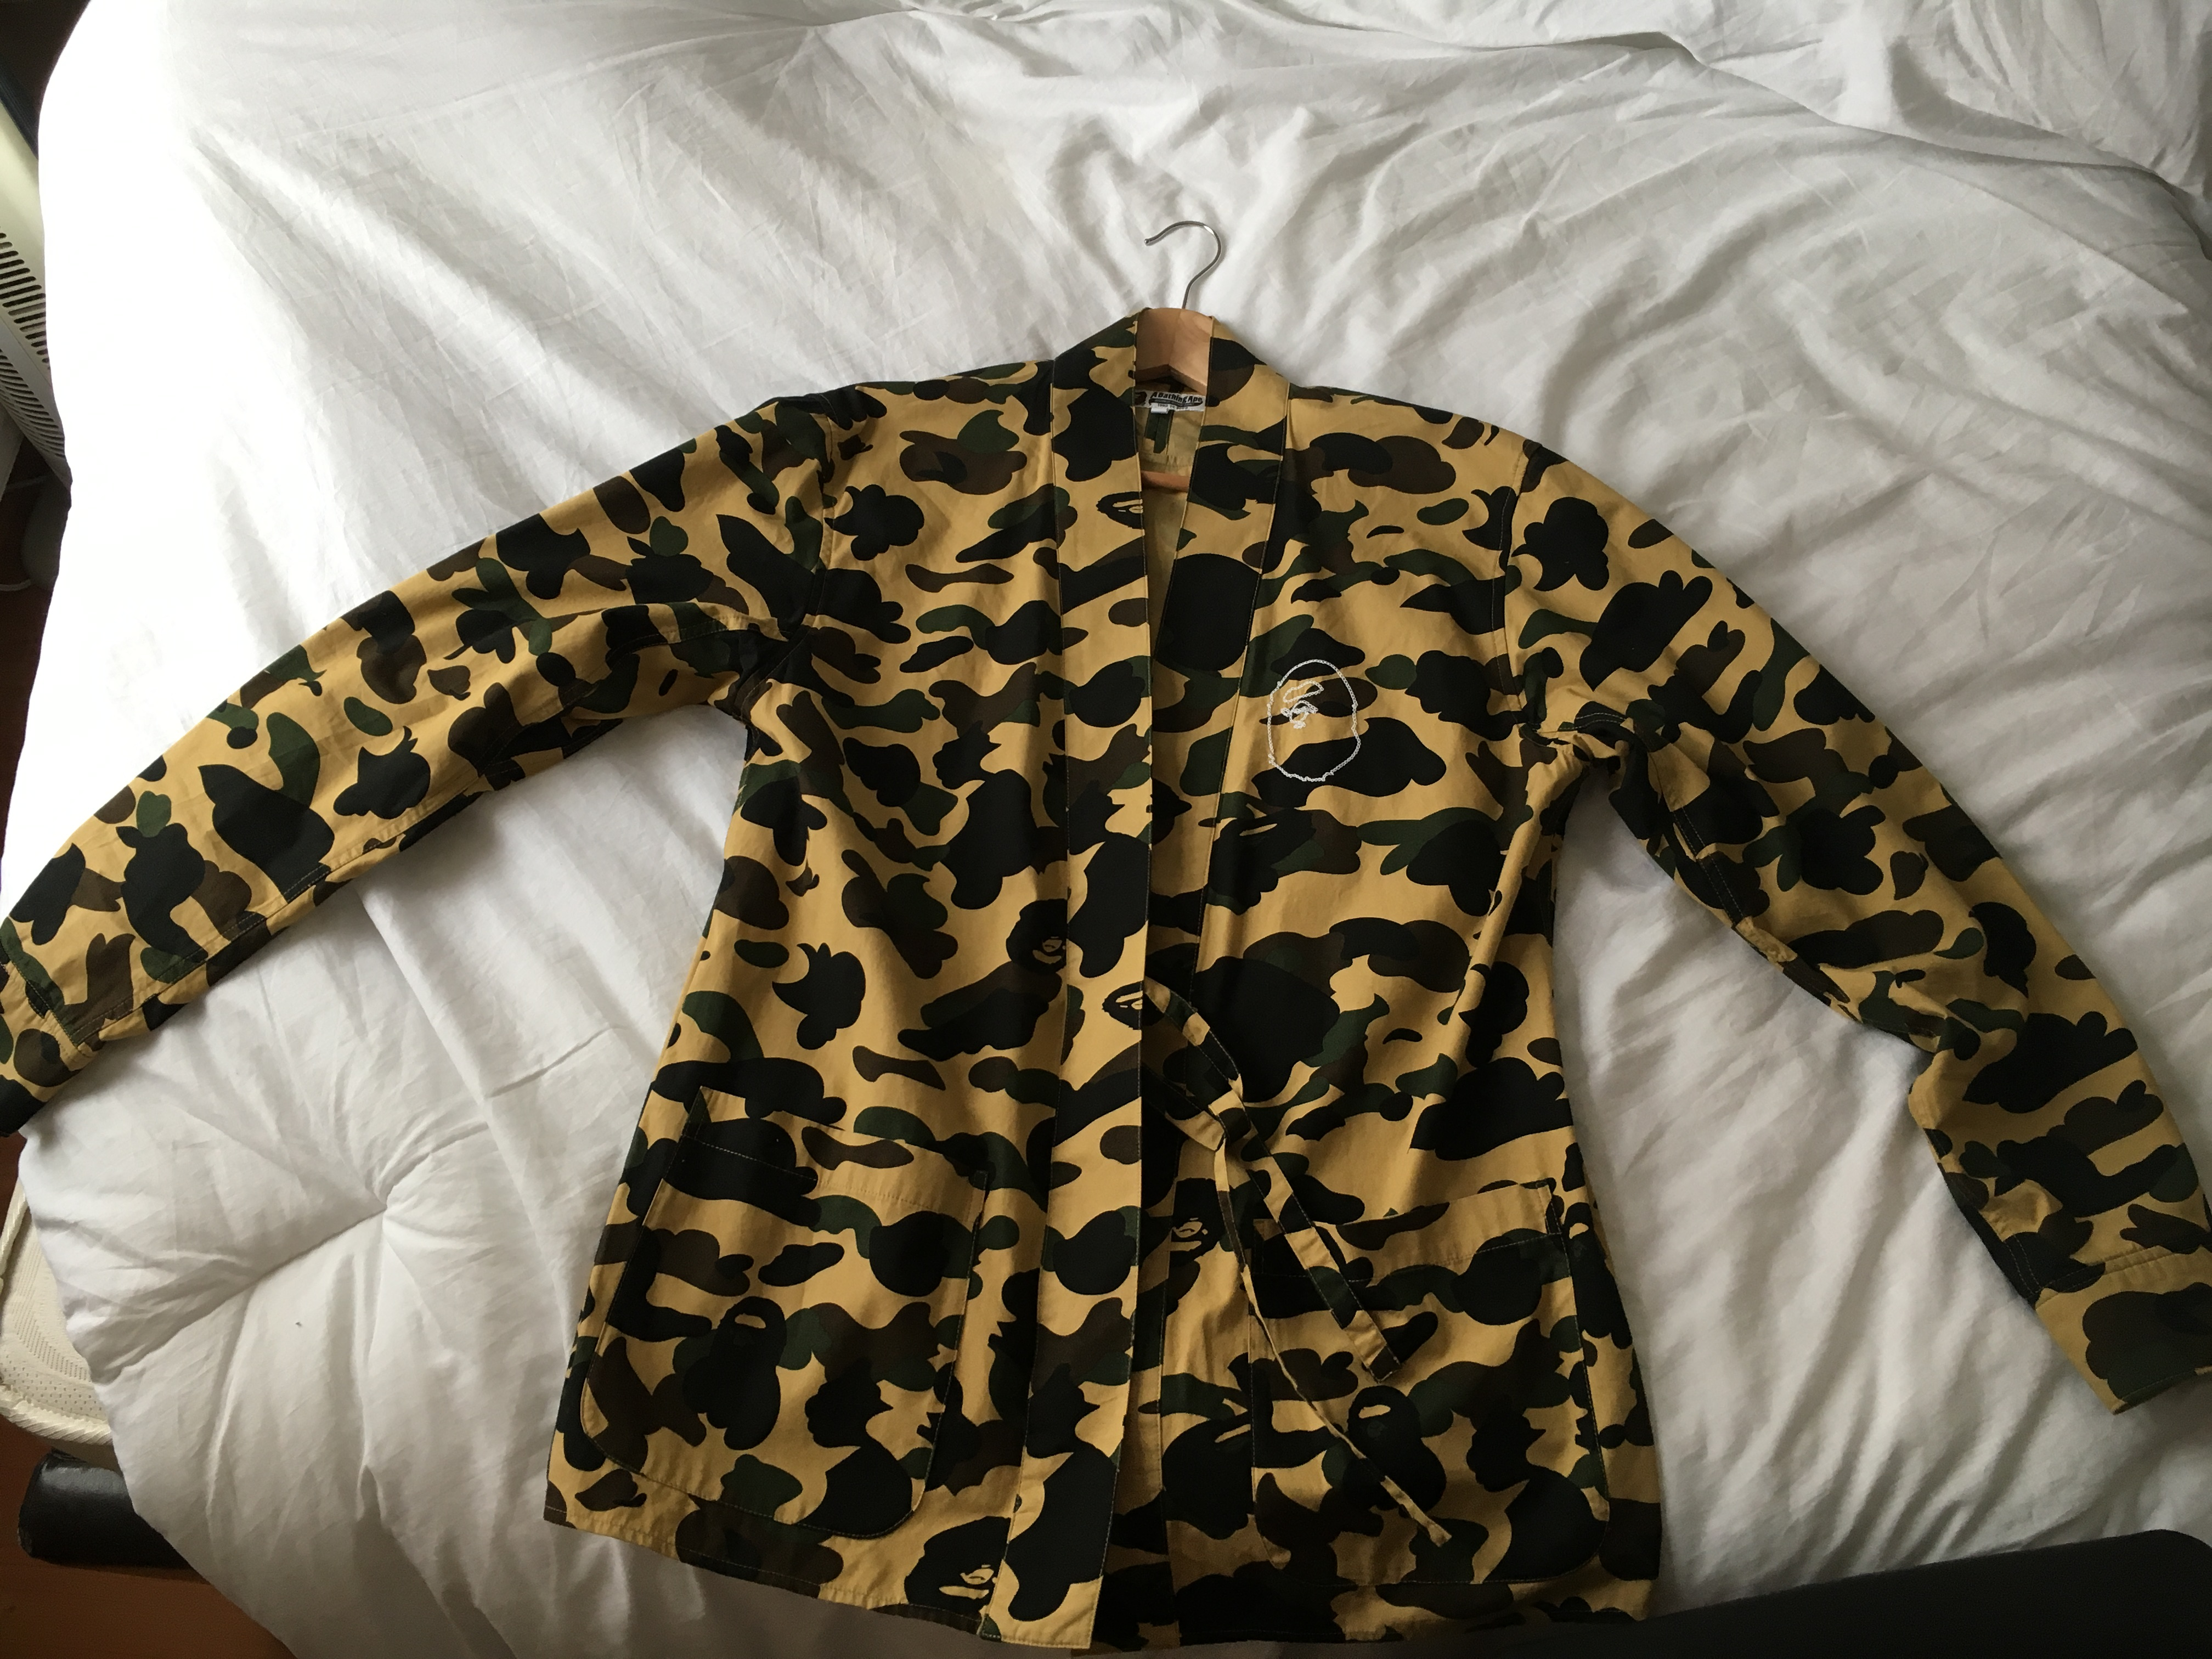 aaa2cea8d Bape Bape 1st Camo Kimono Shirt Size Xl | Grailed